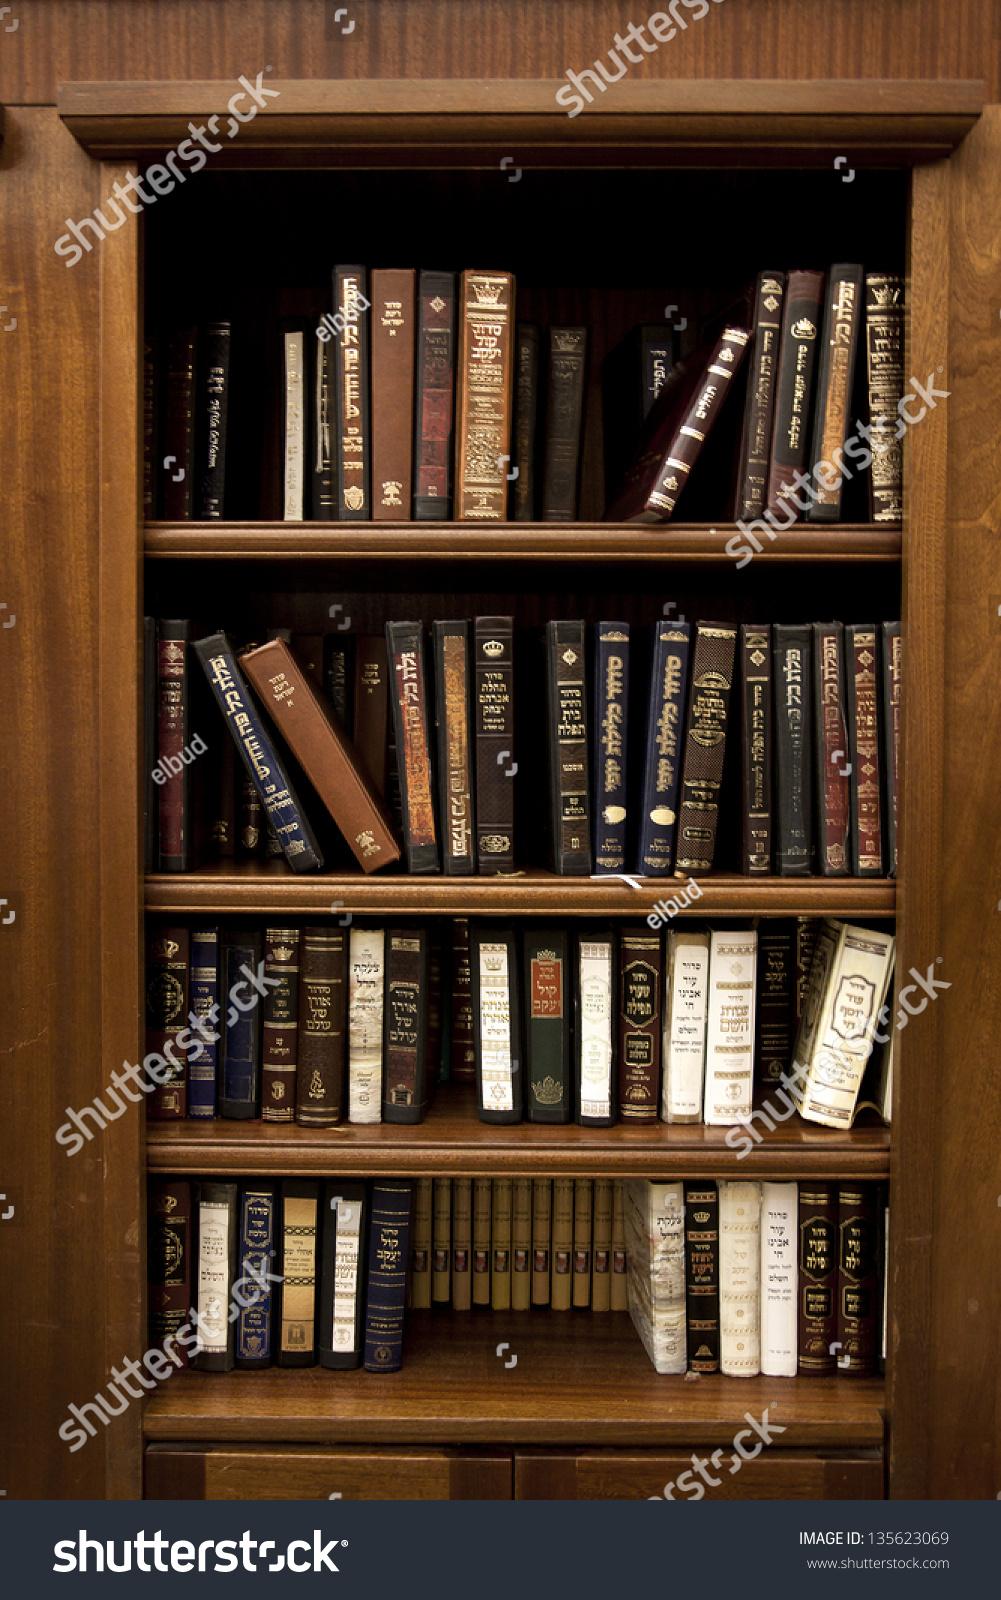 jewish library stock photos - photo #12